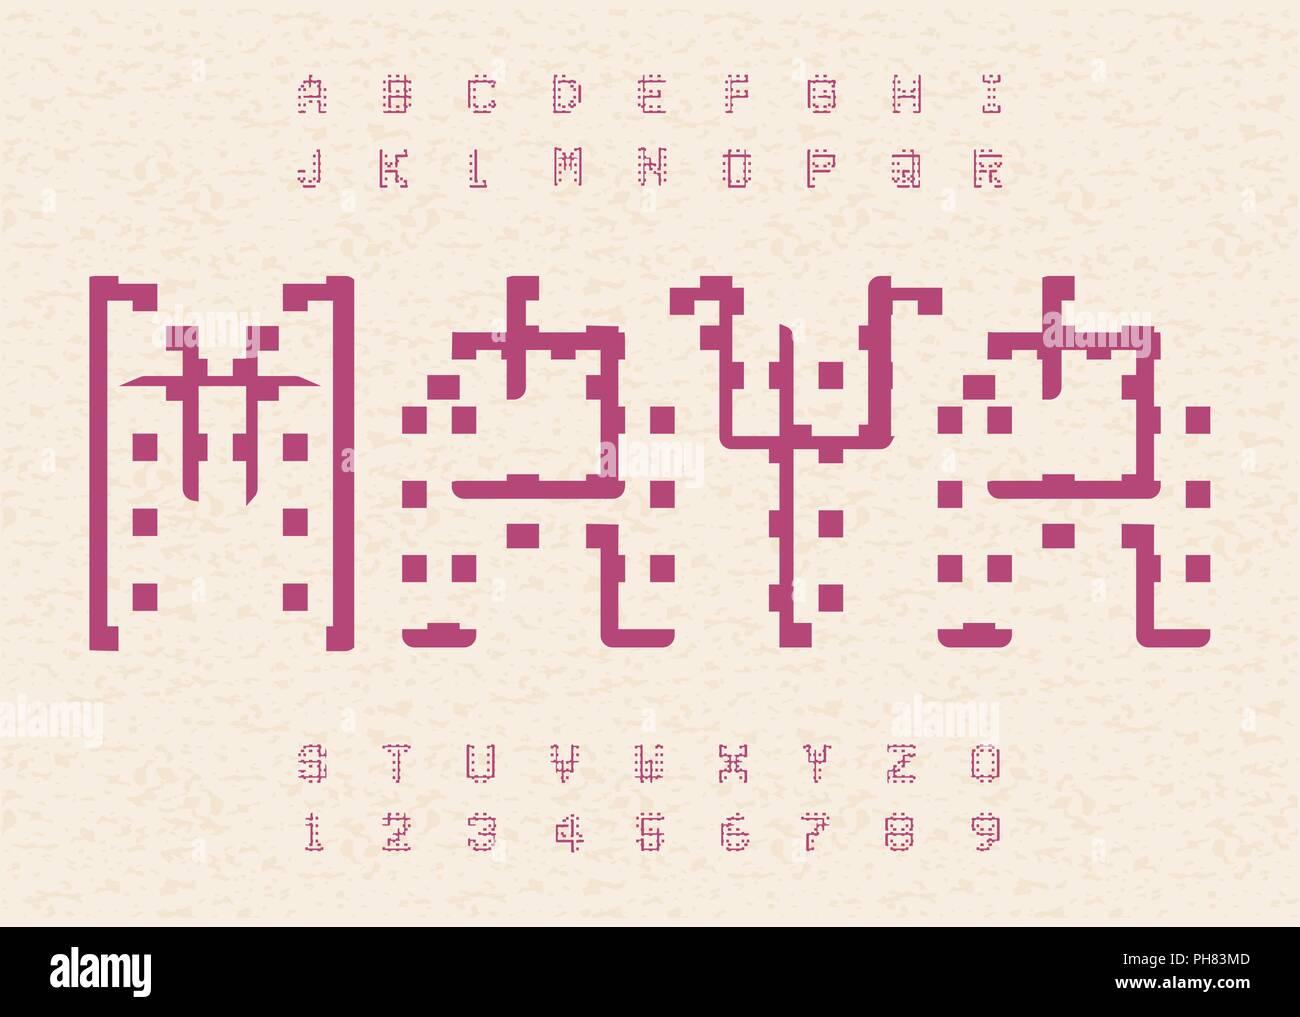 Hieroglyphic Alphabet Stock Photos Amp Hieroglyphic Alphabet